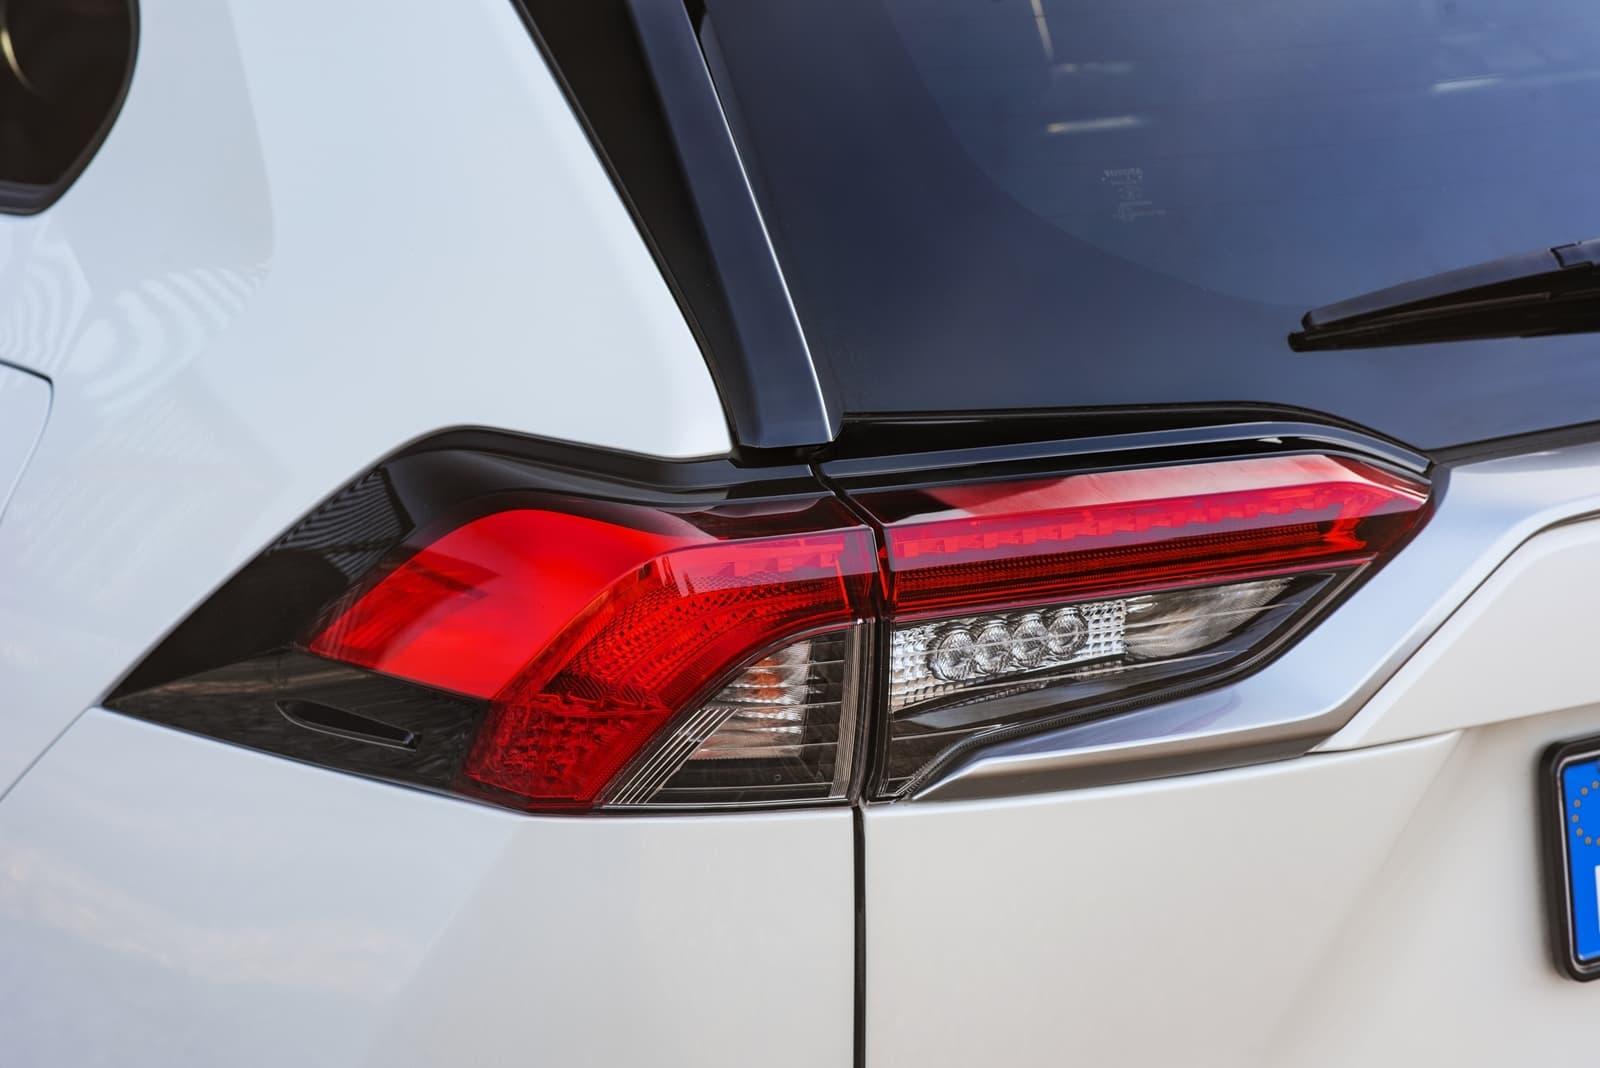 Toyota Rav4 2019 0119 007 Piloto